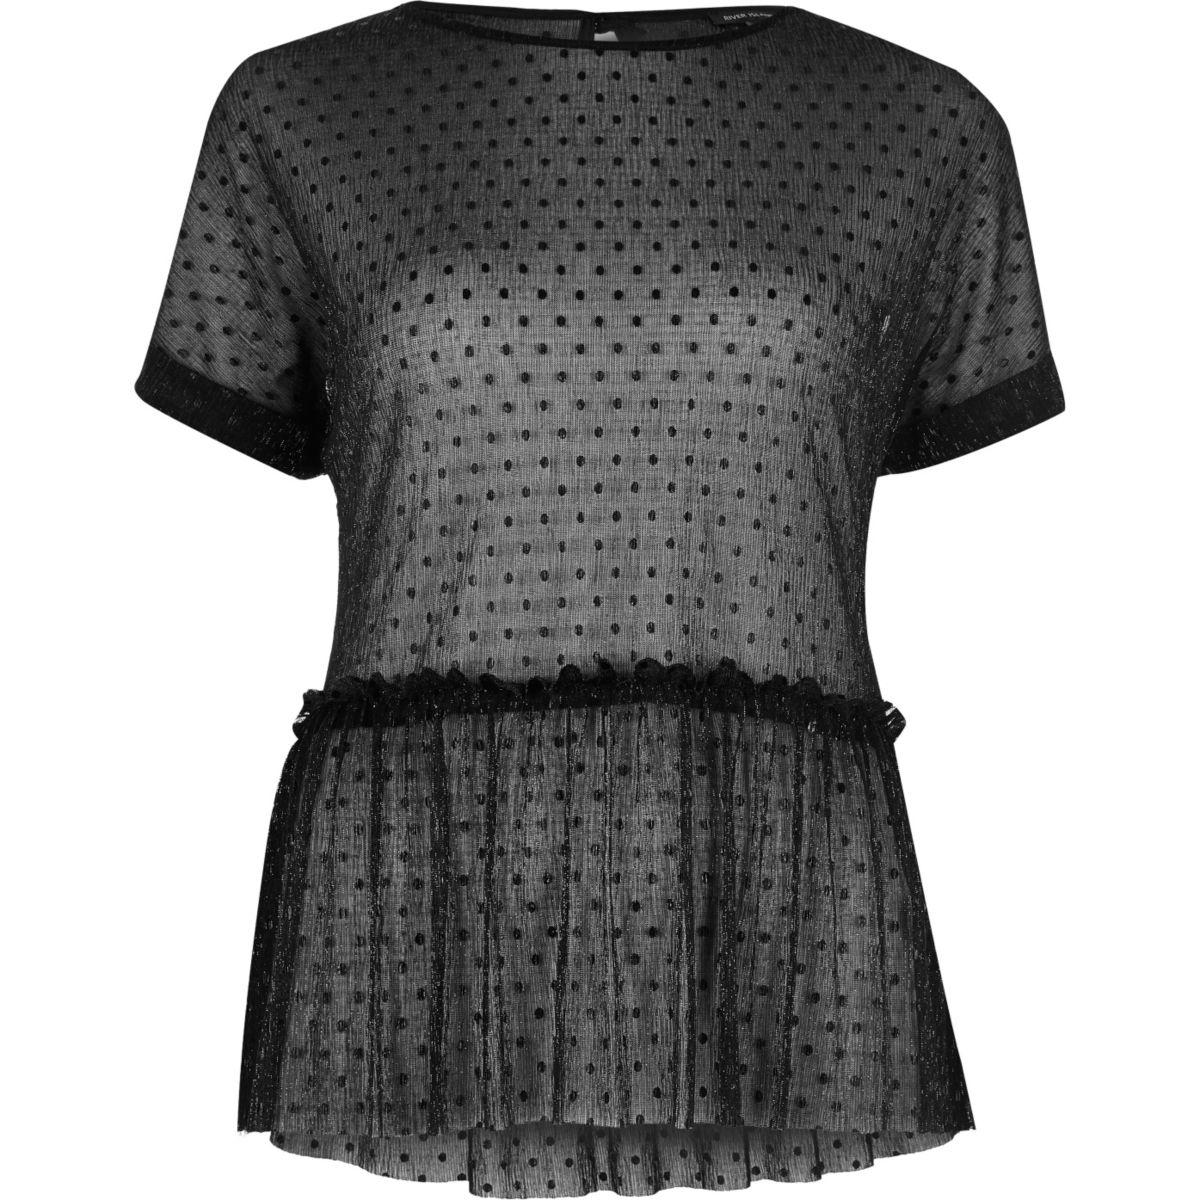 Black polka dot mesh frill top